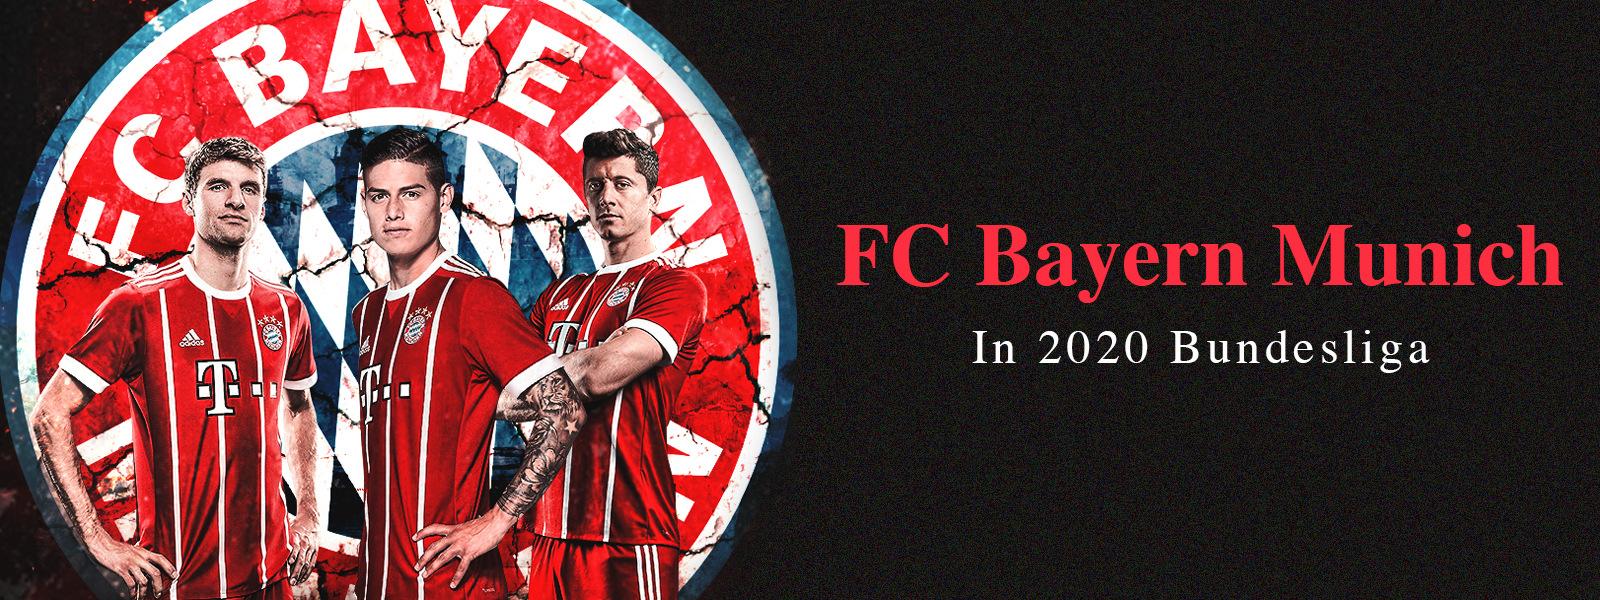 Reviewing FC Bayern Munich In 2020 Bundesliga